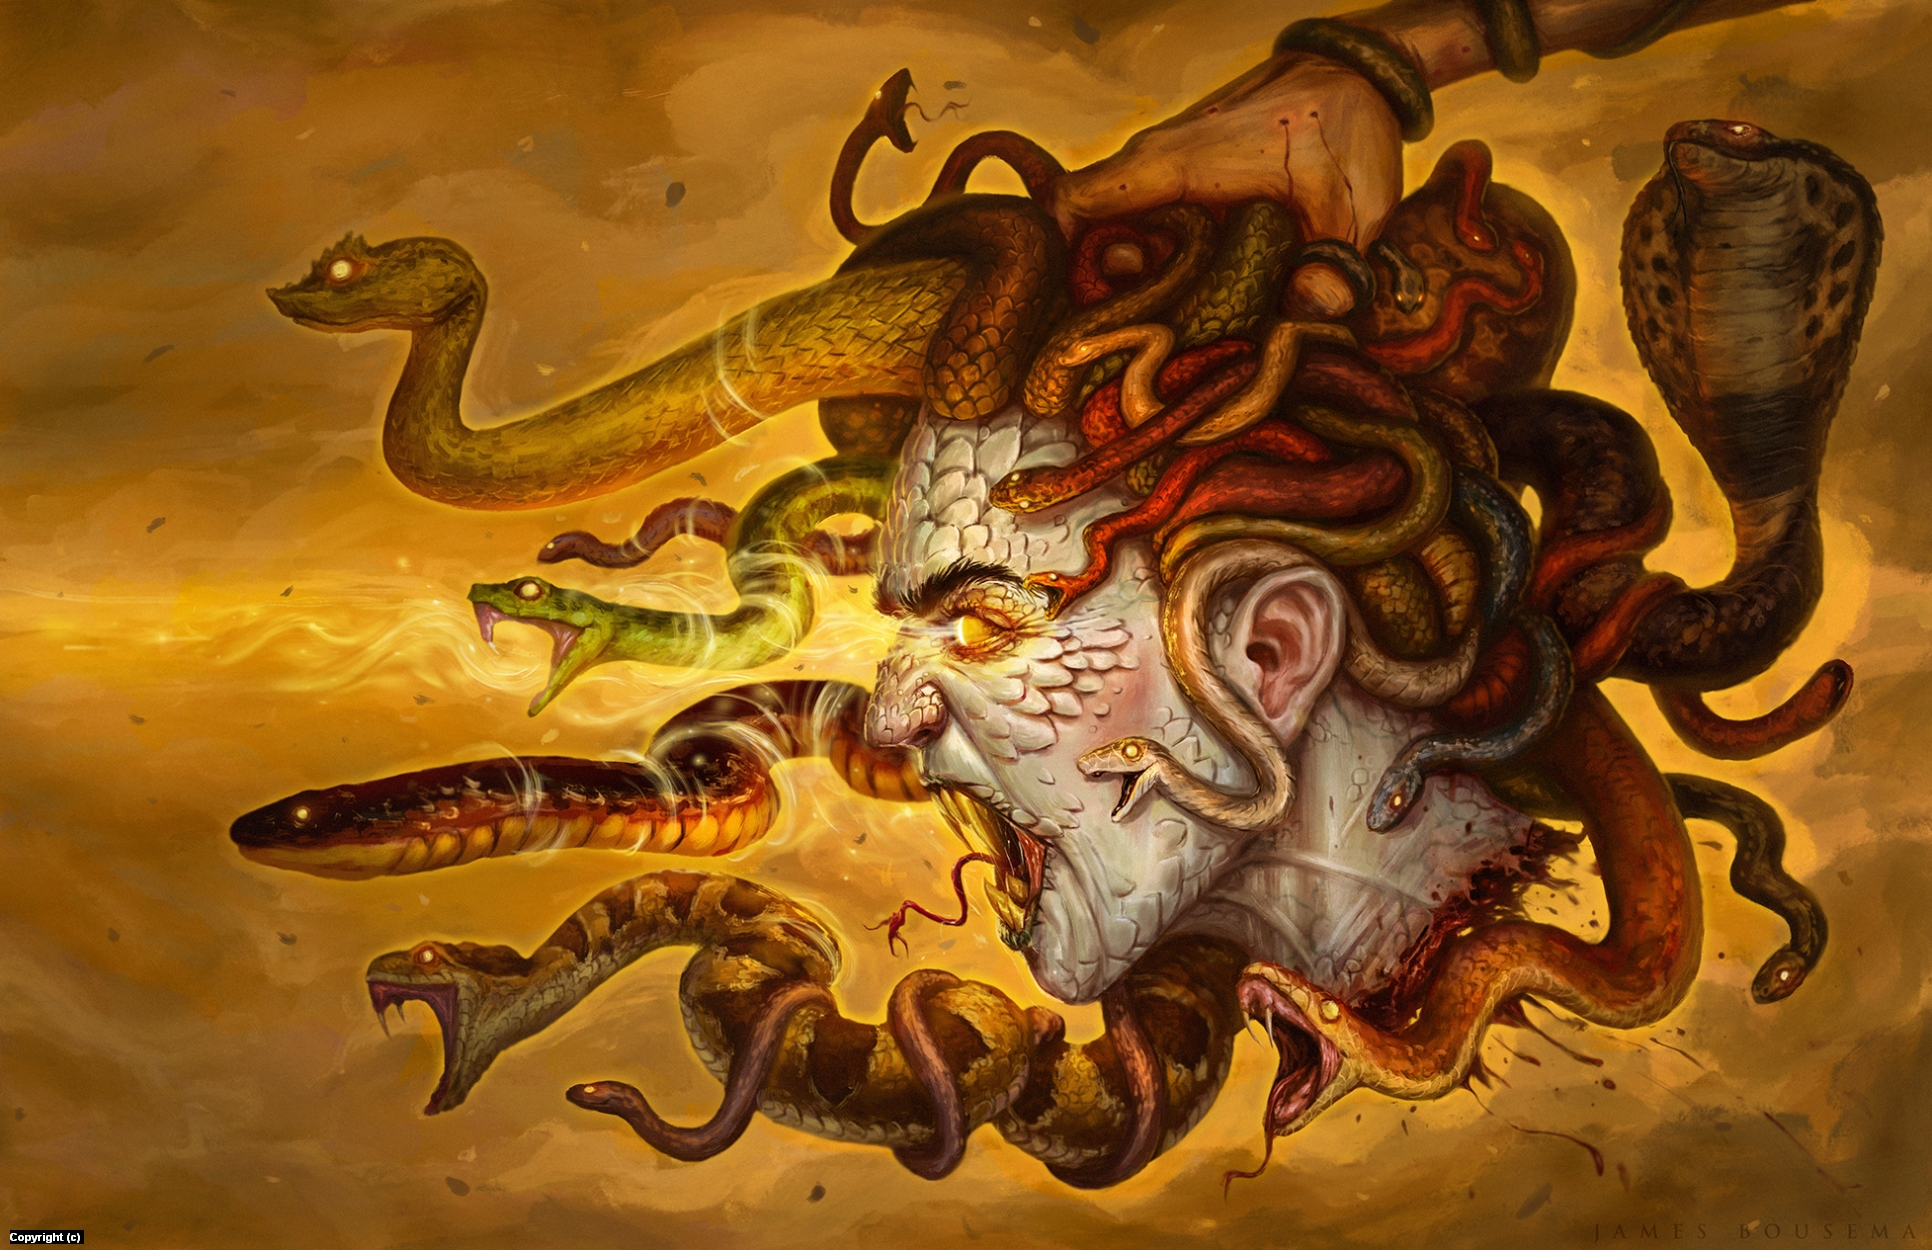 Medusa Artwork by James Bousema